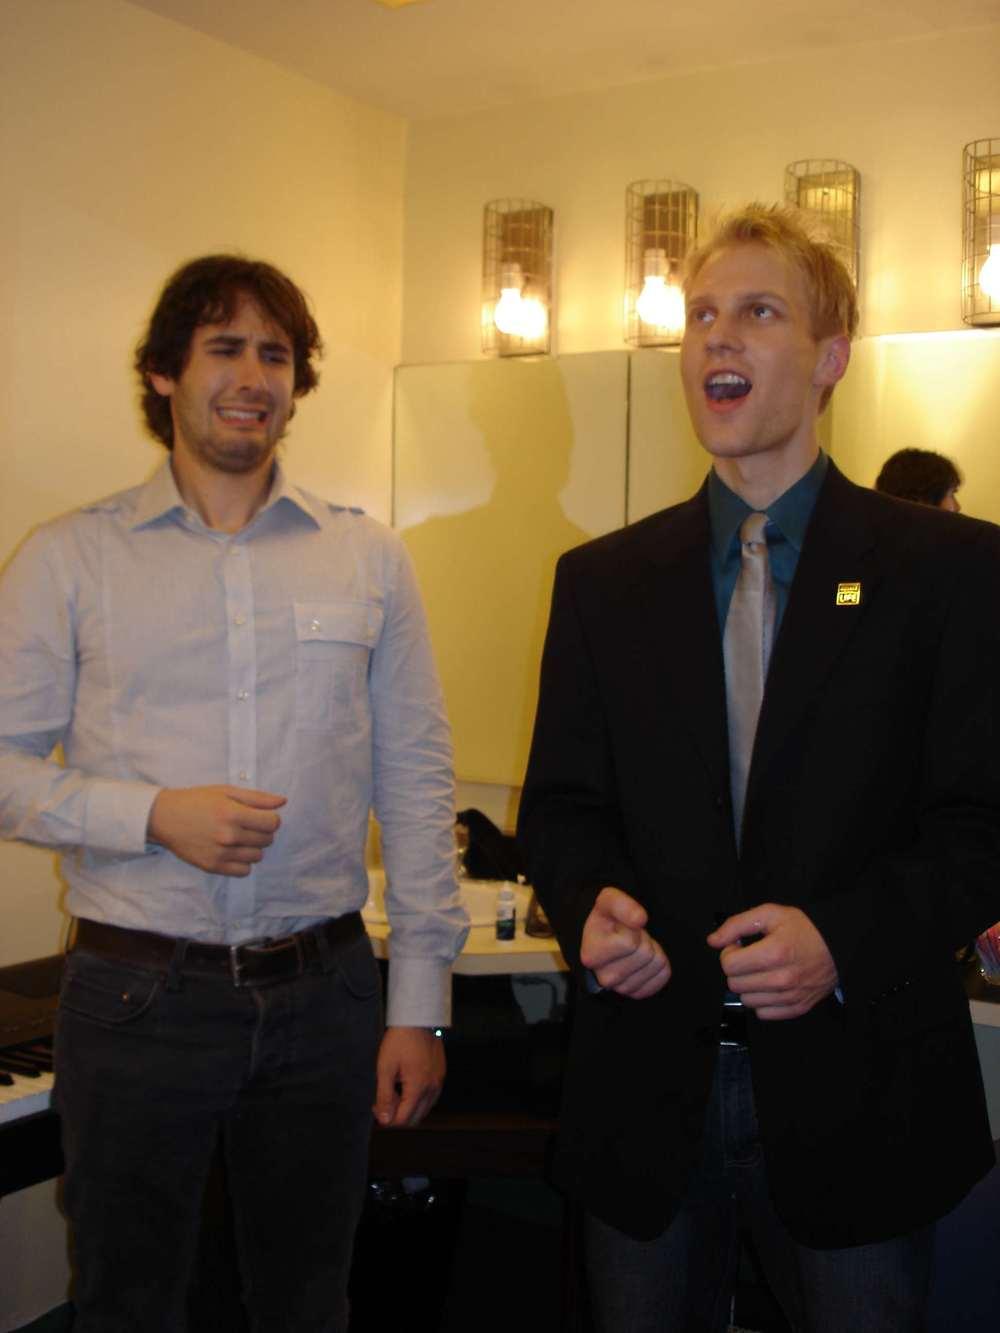 Josh & Brian.jpg